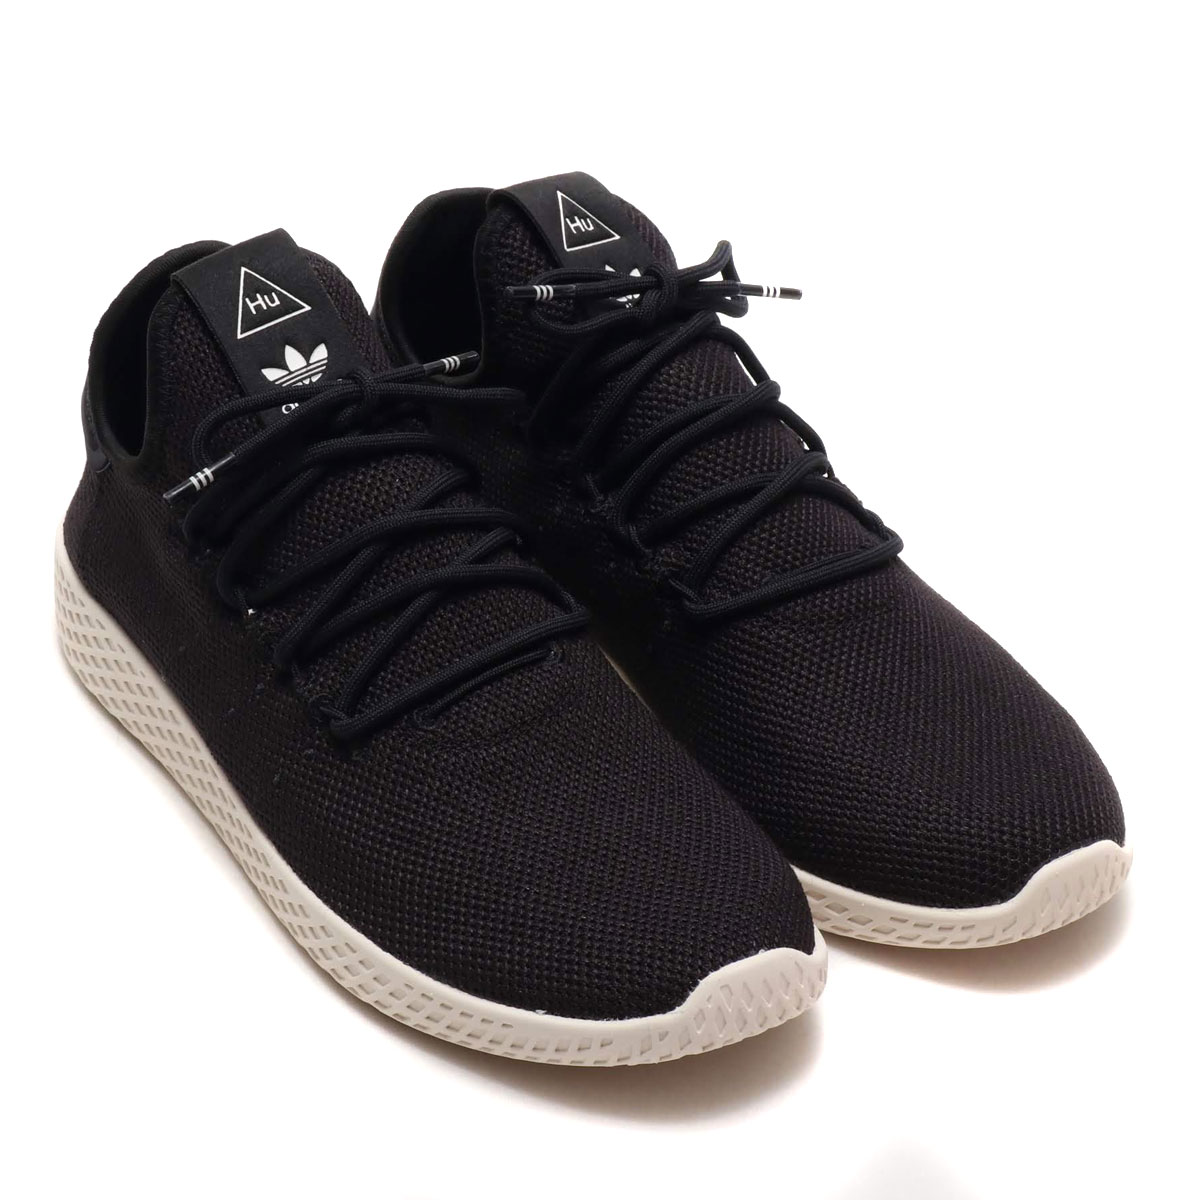 96d3688bf adidas Originals PW TENNIS HU (CORE BLACK CORE BLACK CHALK WHITE) (Adidas  originals PW tennis HU)